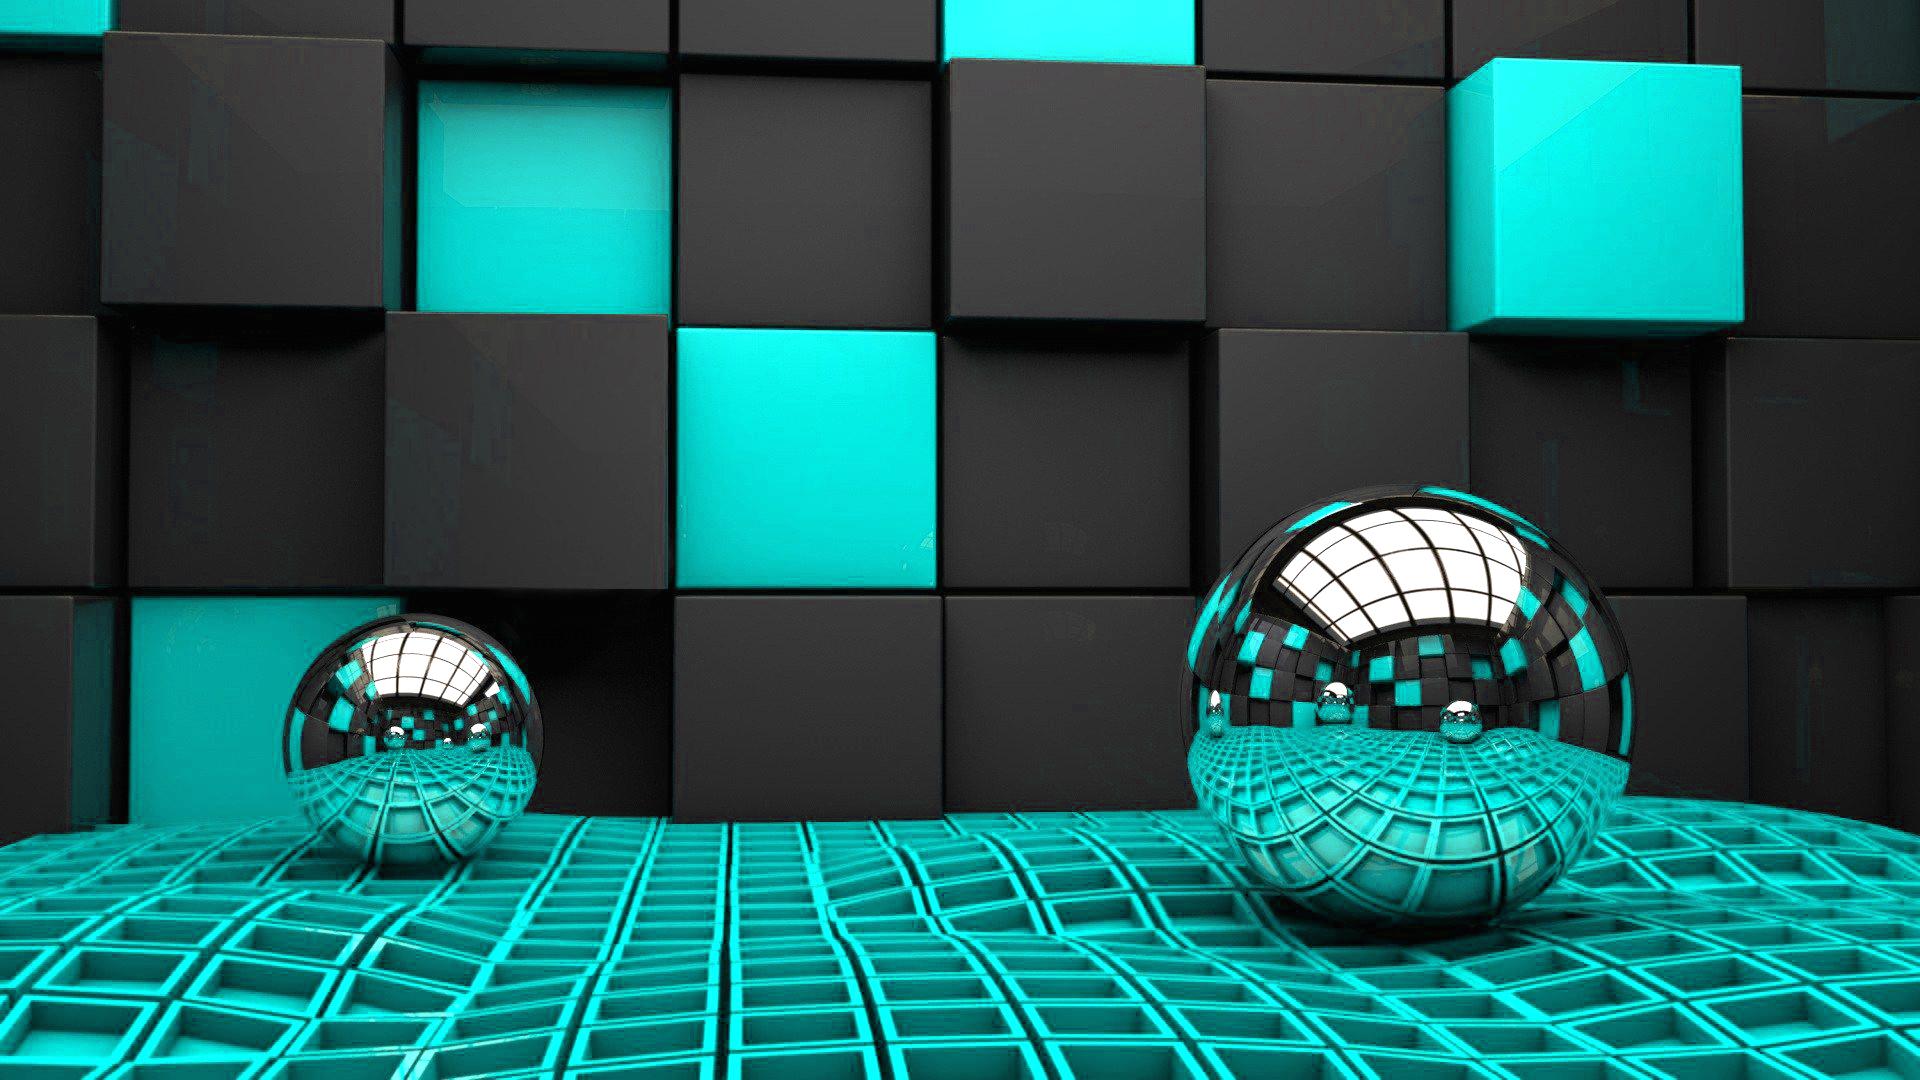 3D Wallpaper Desktop Download 1920x1080